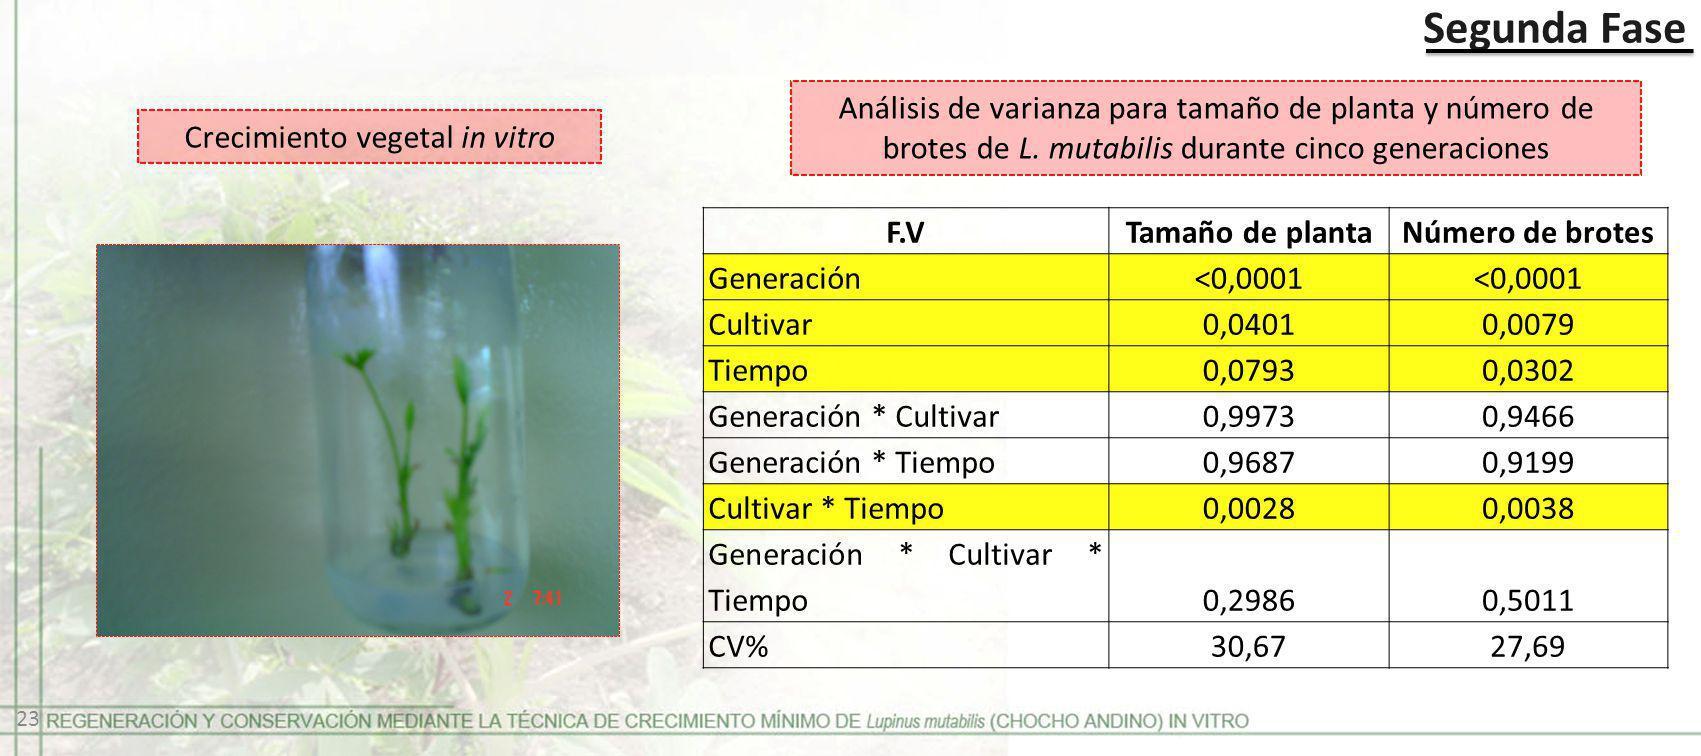 Crecimiento vegetal in vitro